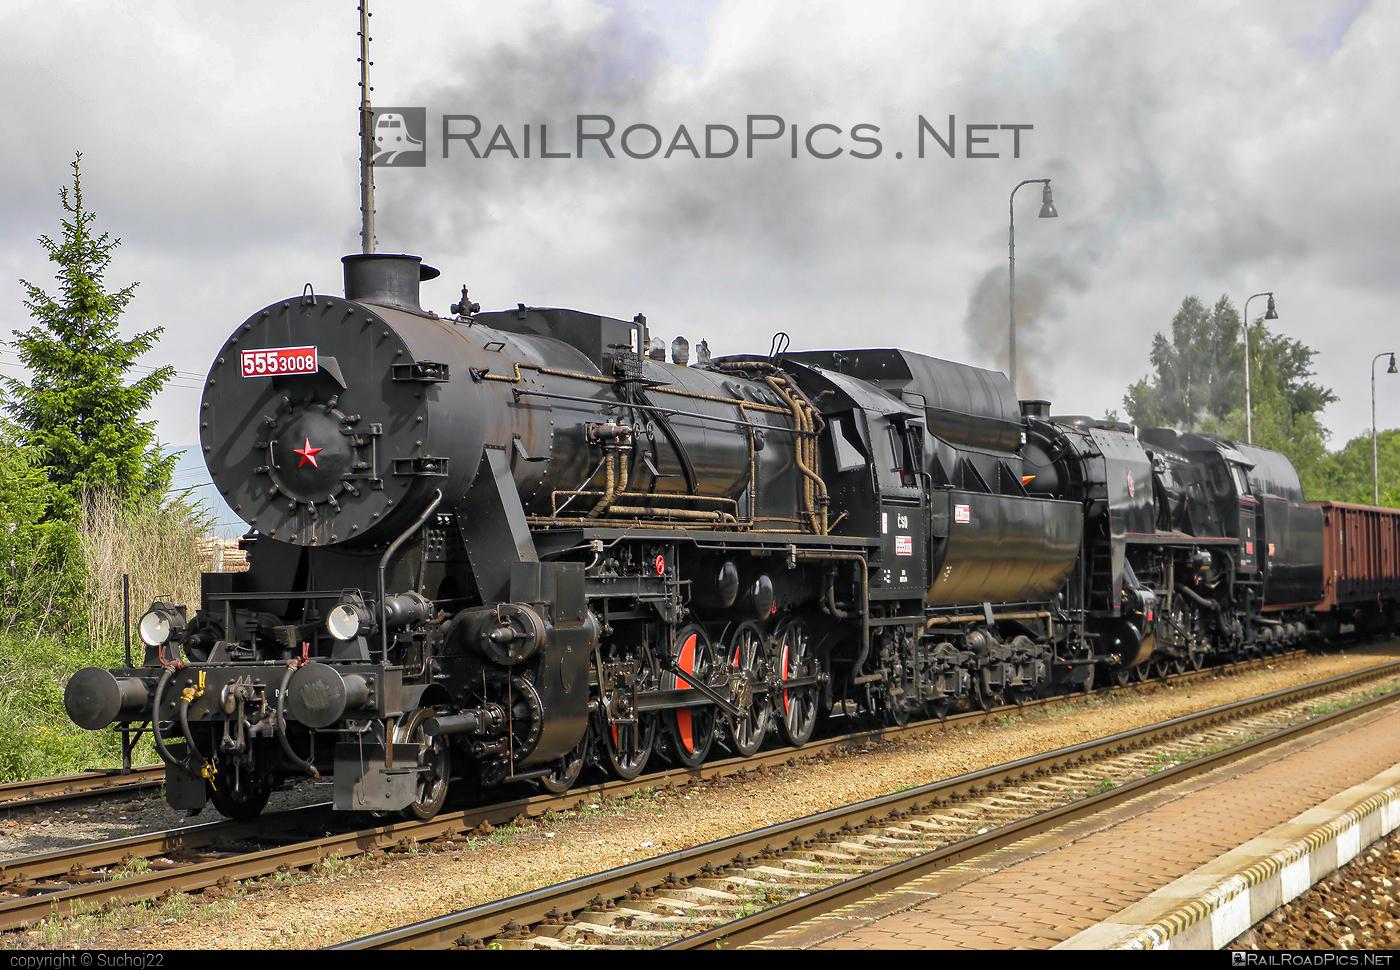 Škoda Class 555.3 - 555.3008 operated by Železnice Slovenskej Republiky #locomotive5553 #skoda #skodaClass5553 #zelezniceslovenskejrepubliky #zsr